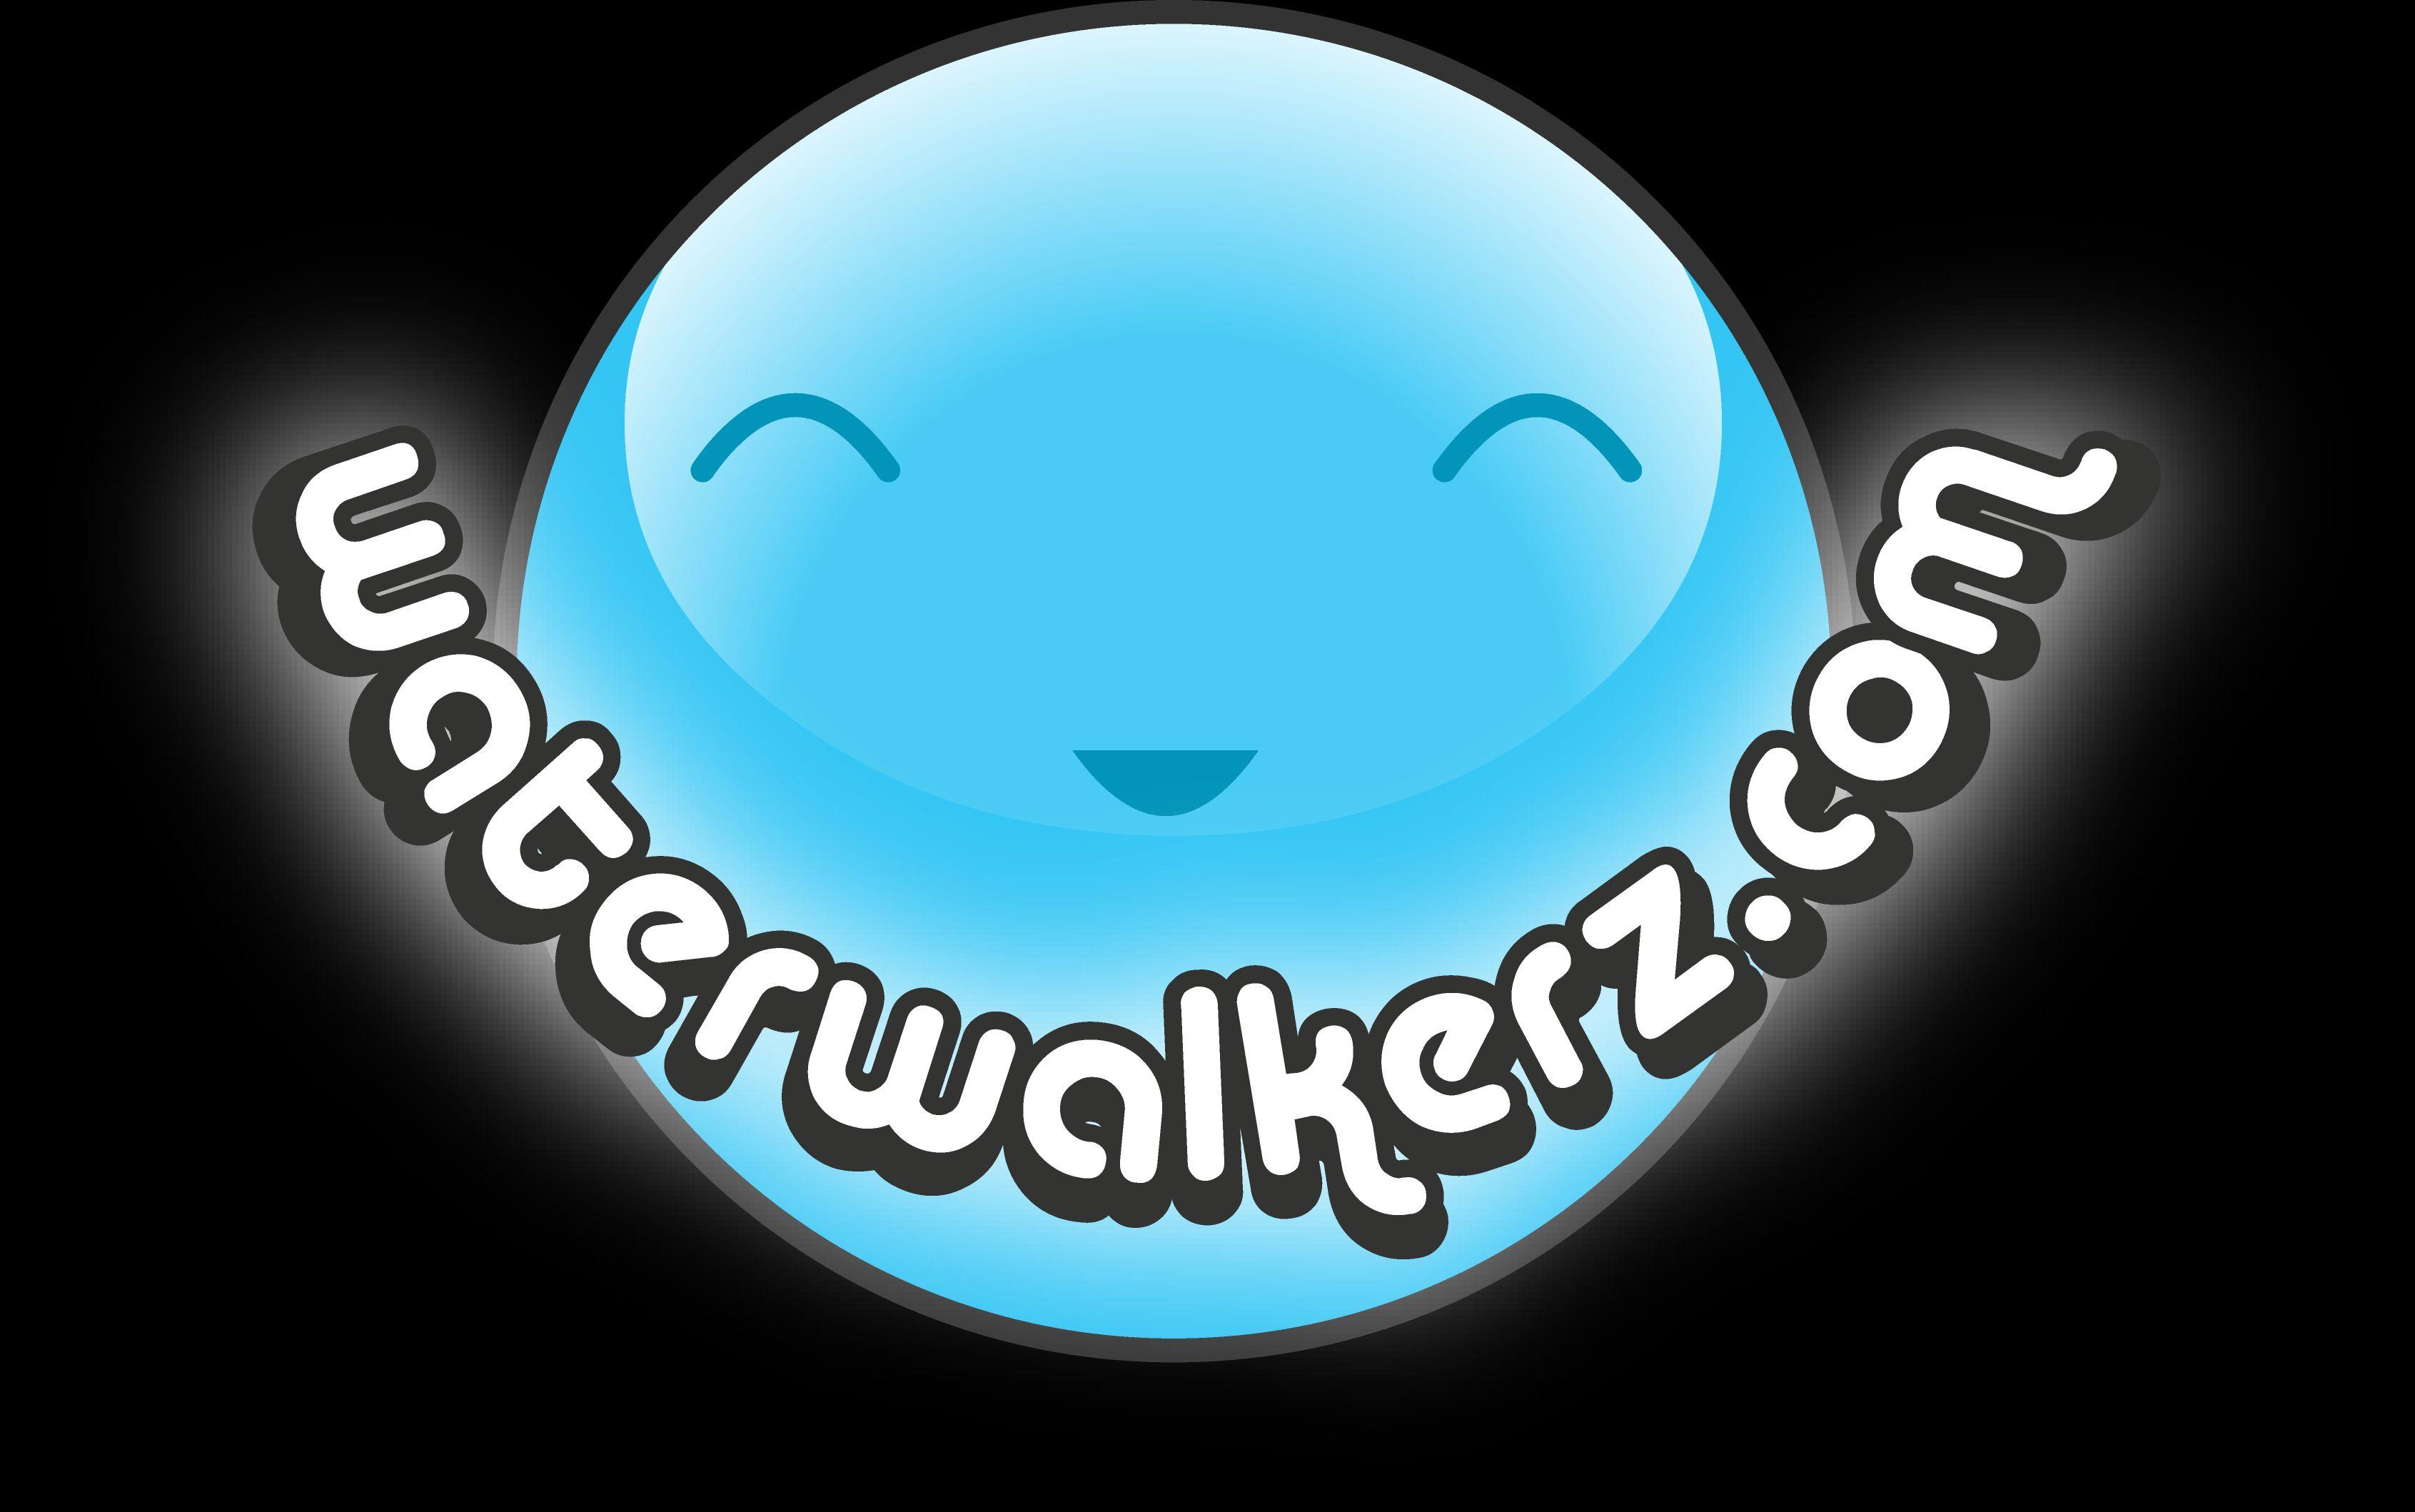 Water Walkerz